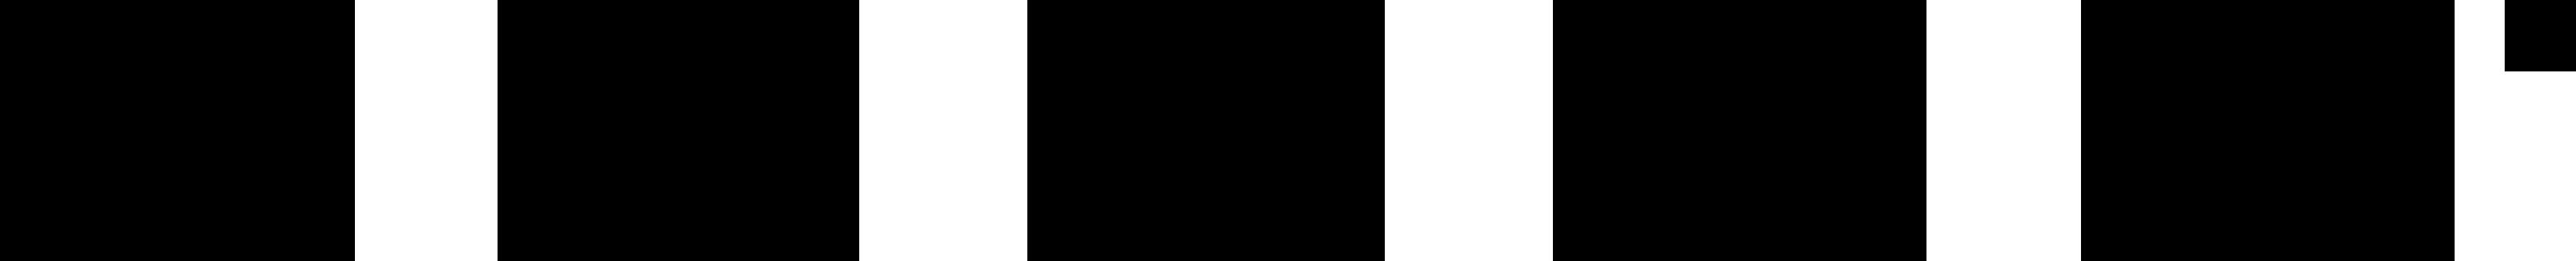 logo chubb